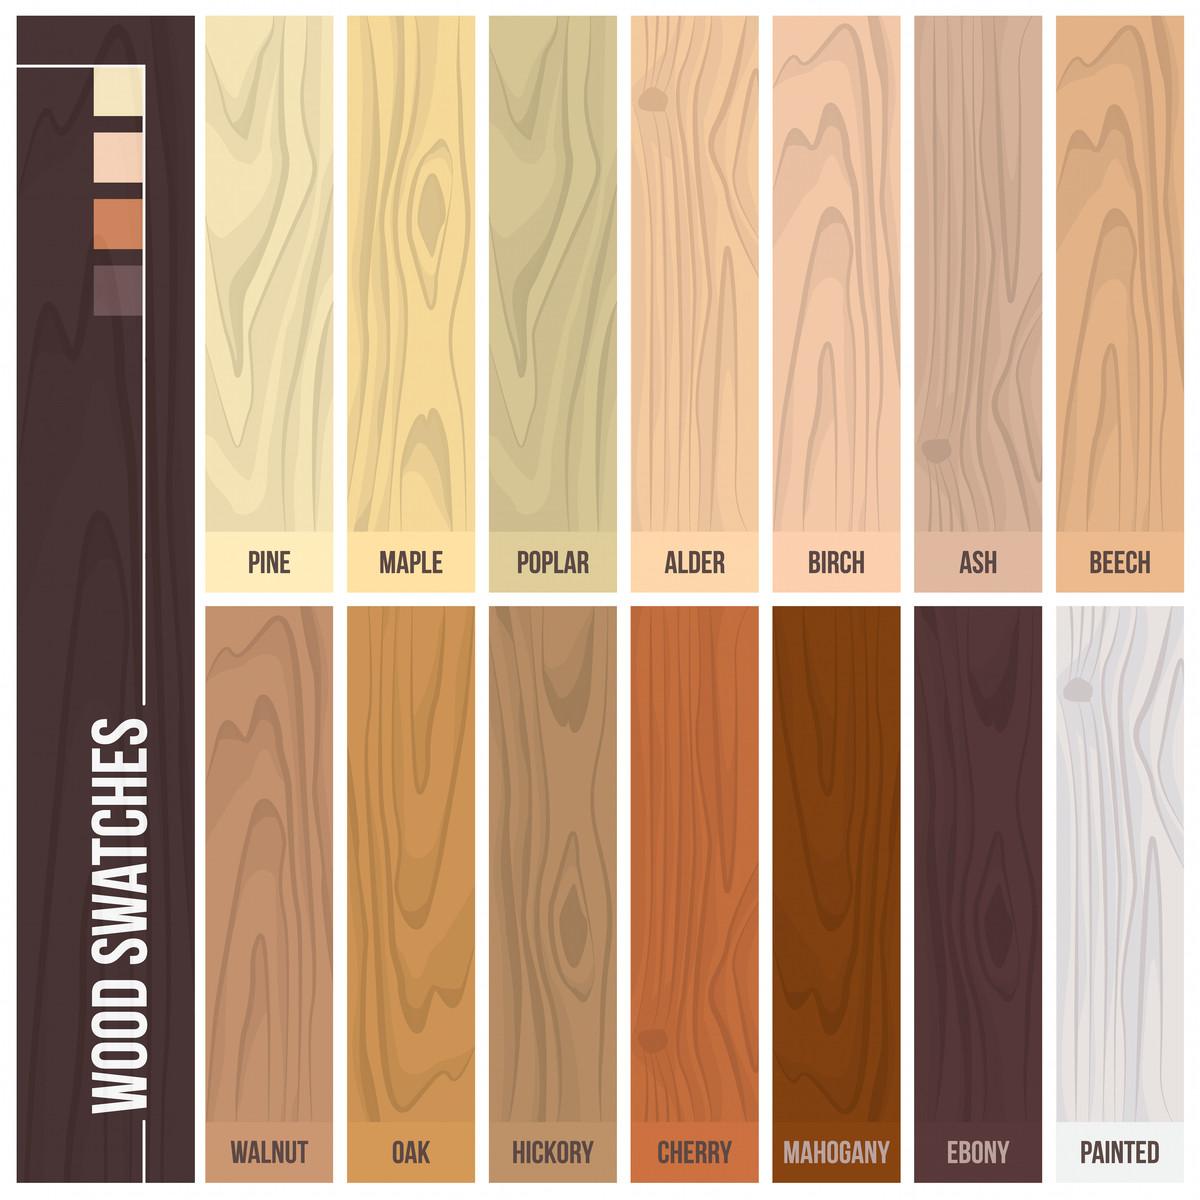 3 8 X 2 1 4 Hardwood Flooring Of 12 Types Of Hardwood Flooring Species Styles Edging Dimensions within Types Of Hardwood Flooring Illustrated Guide